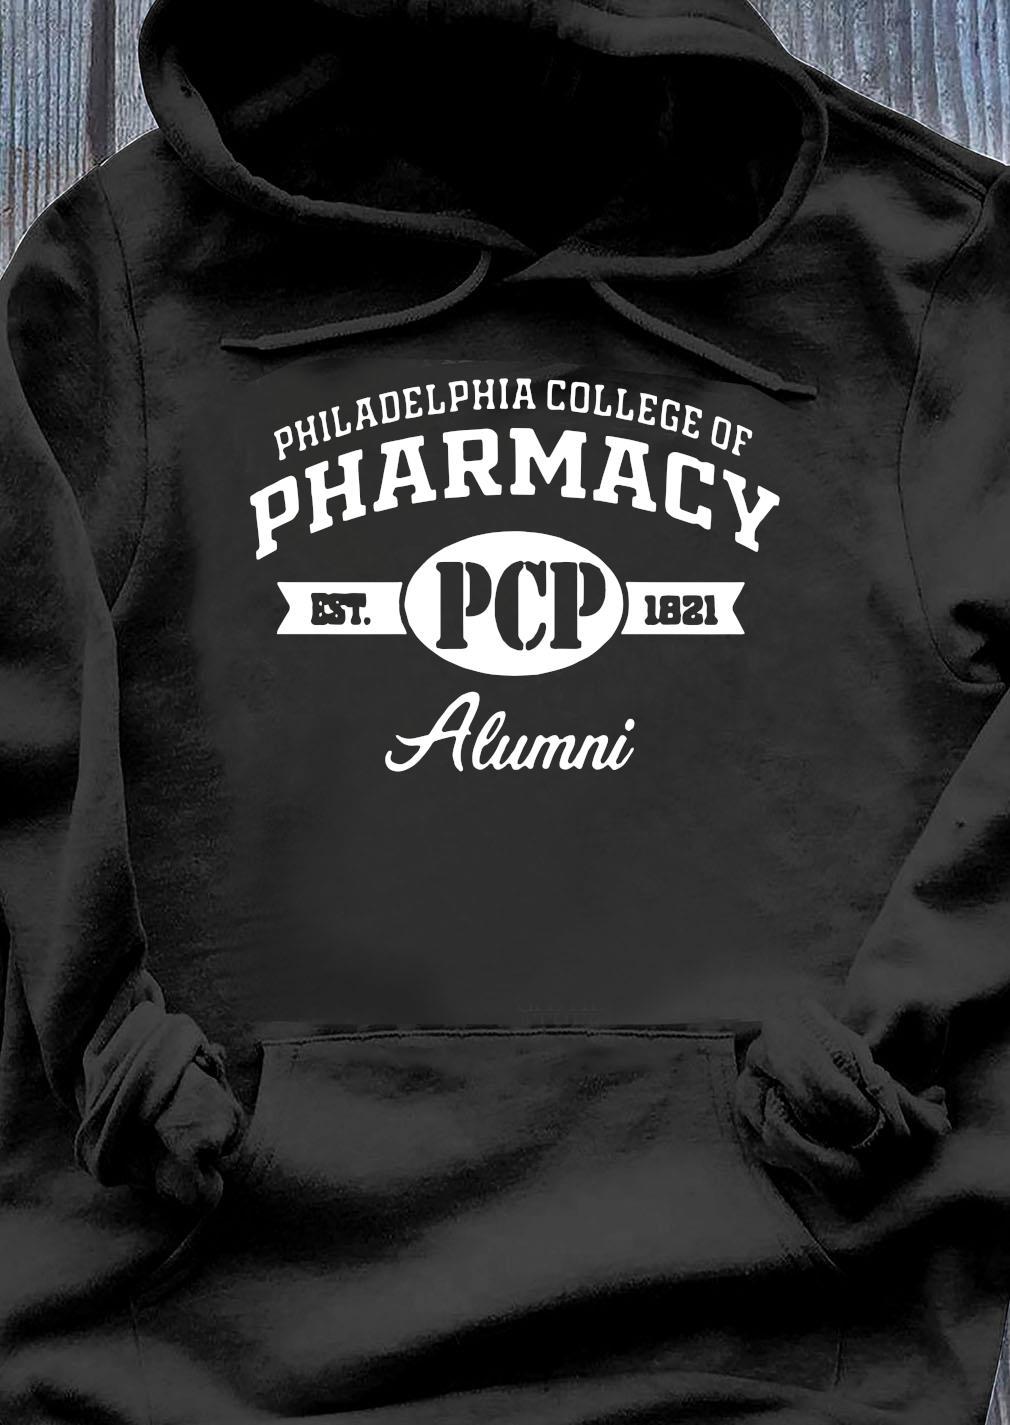 Philadelphia College Of Pharmacy Est PCP 1821 Alumni Shirt Hoodie